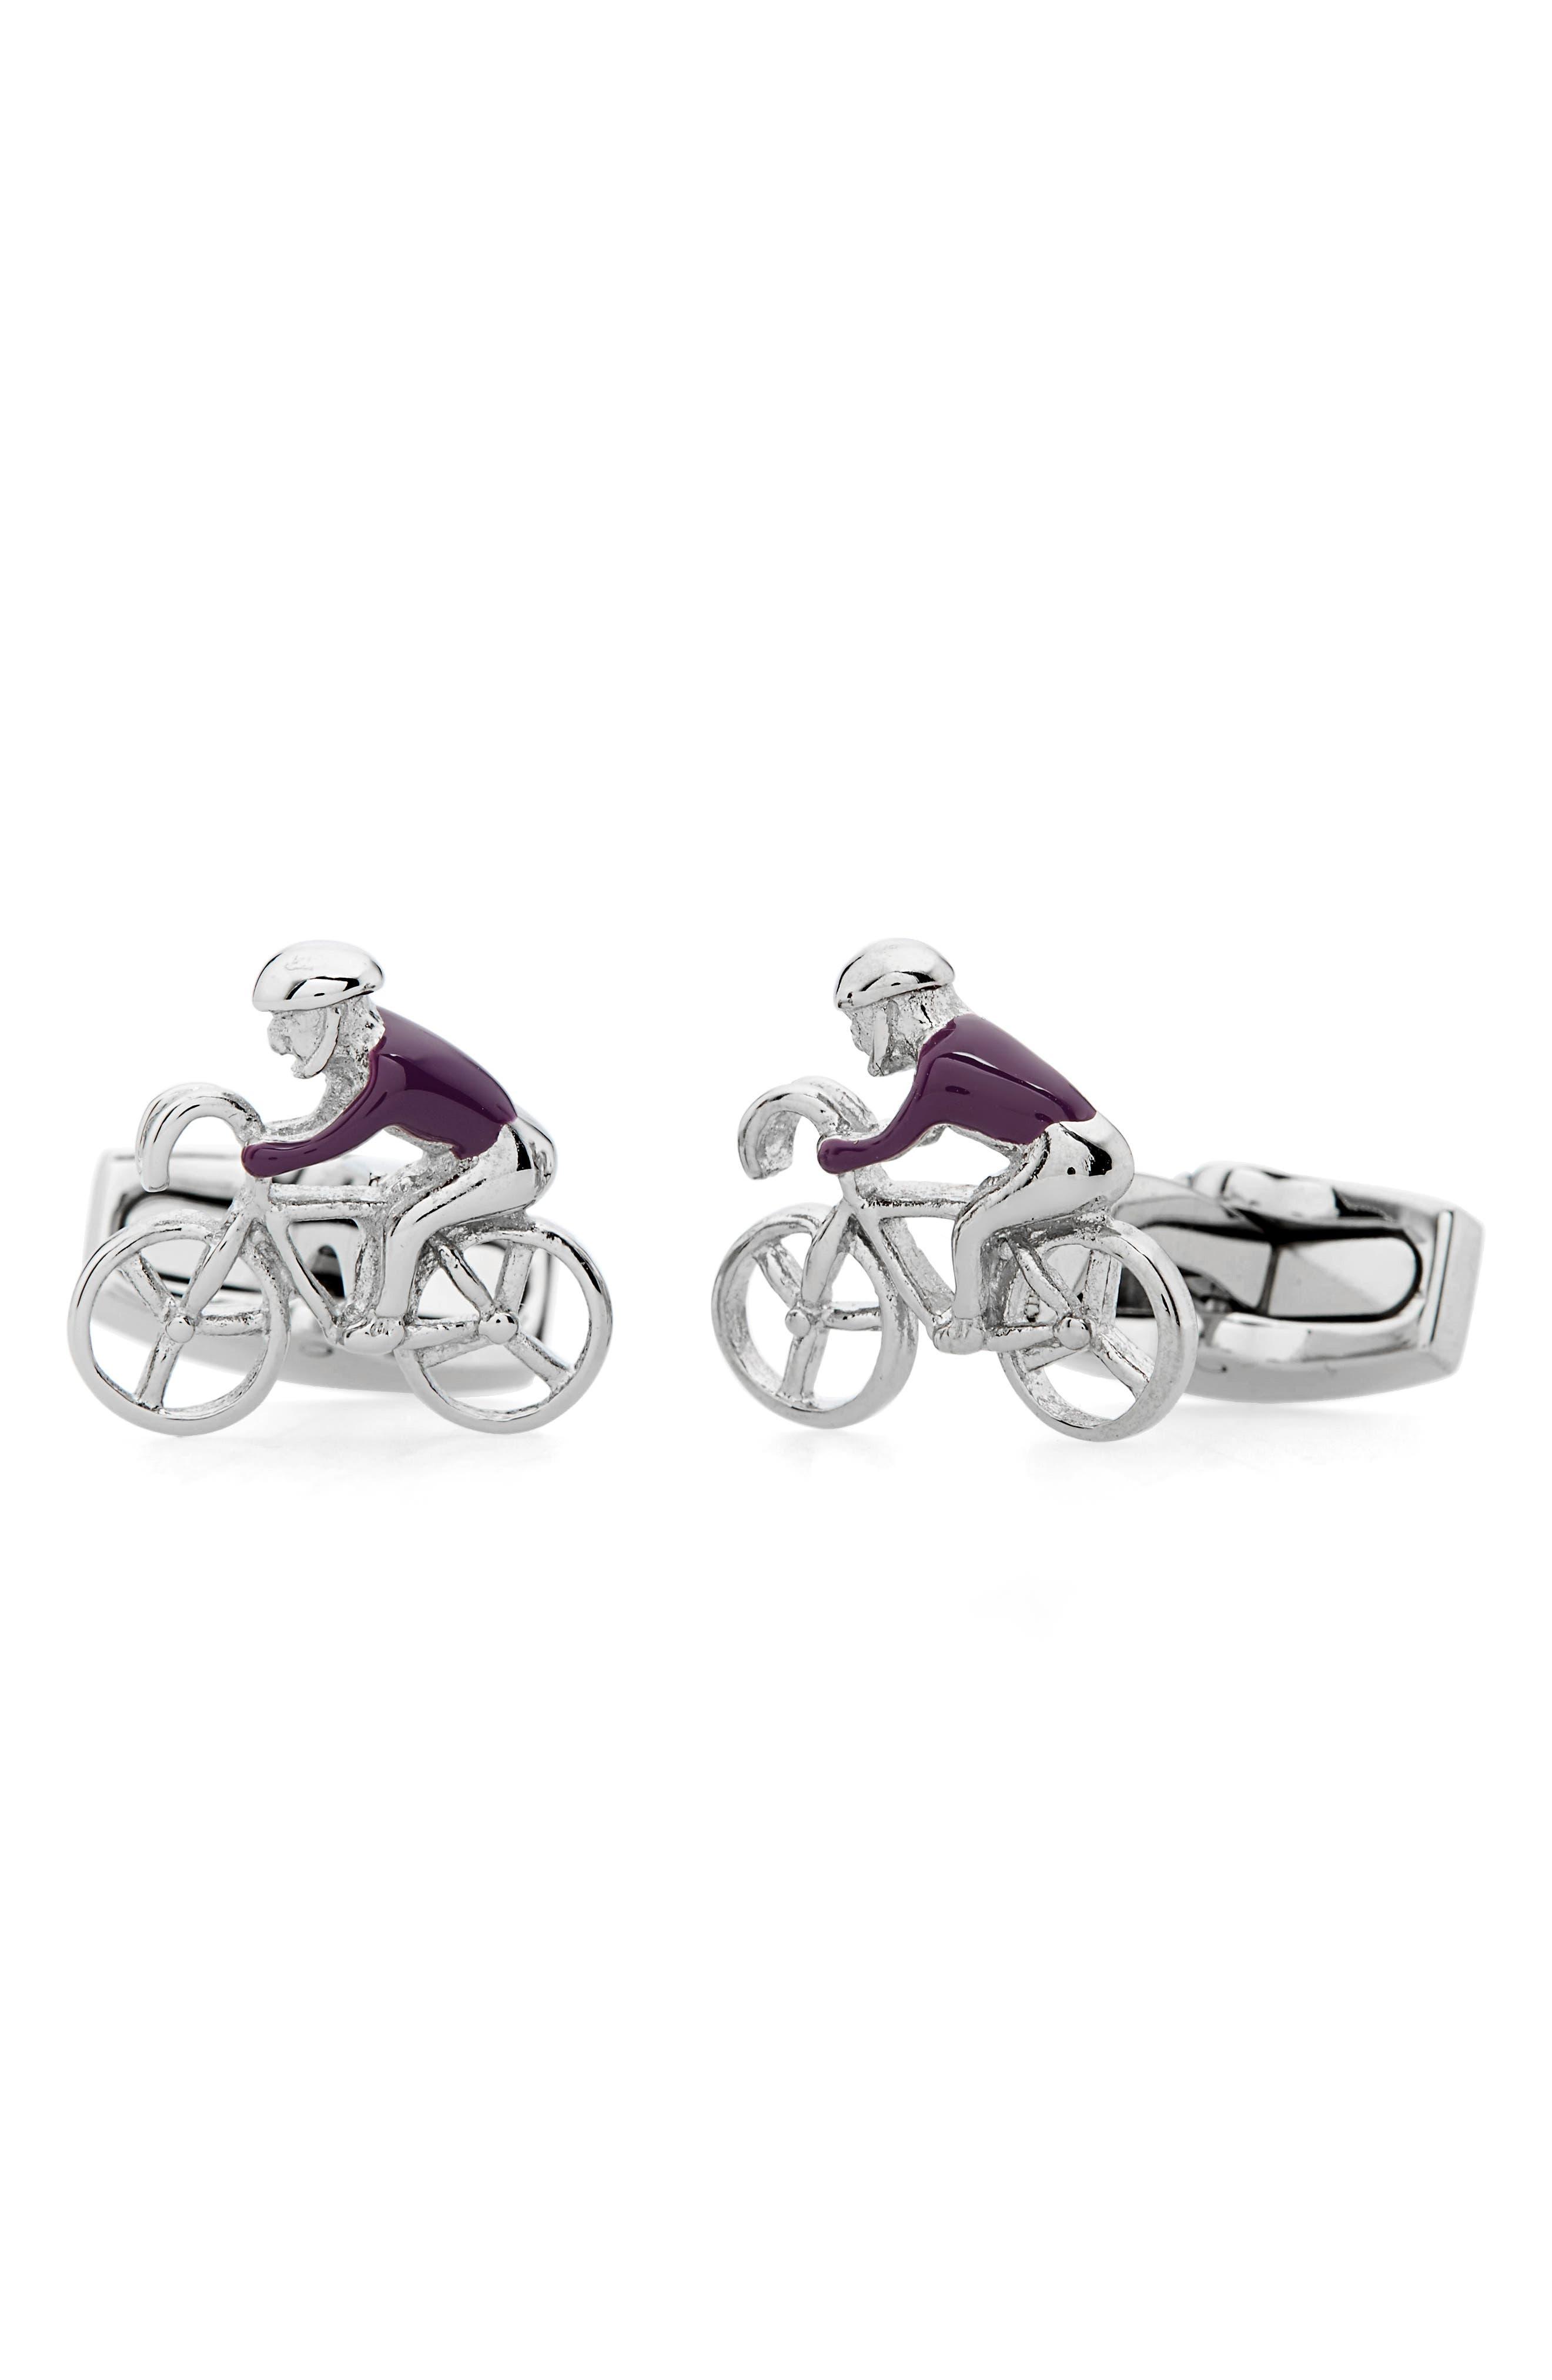 Kahne Bike Cuff Links,                         Main,                         color, Purple